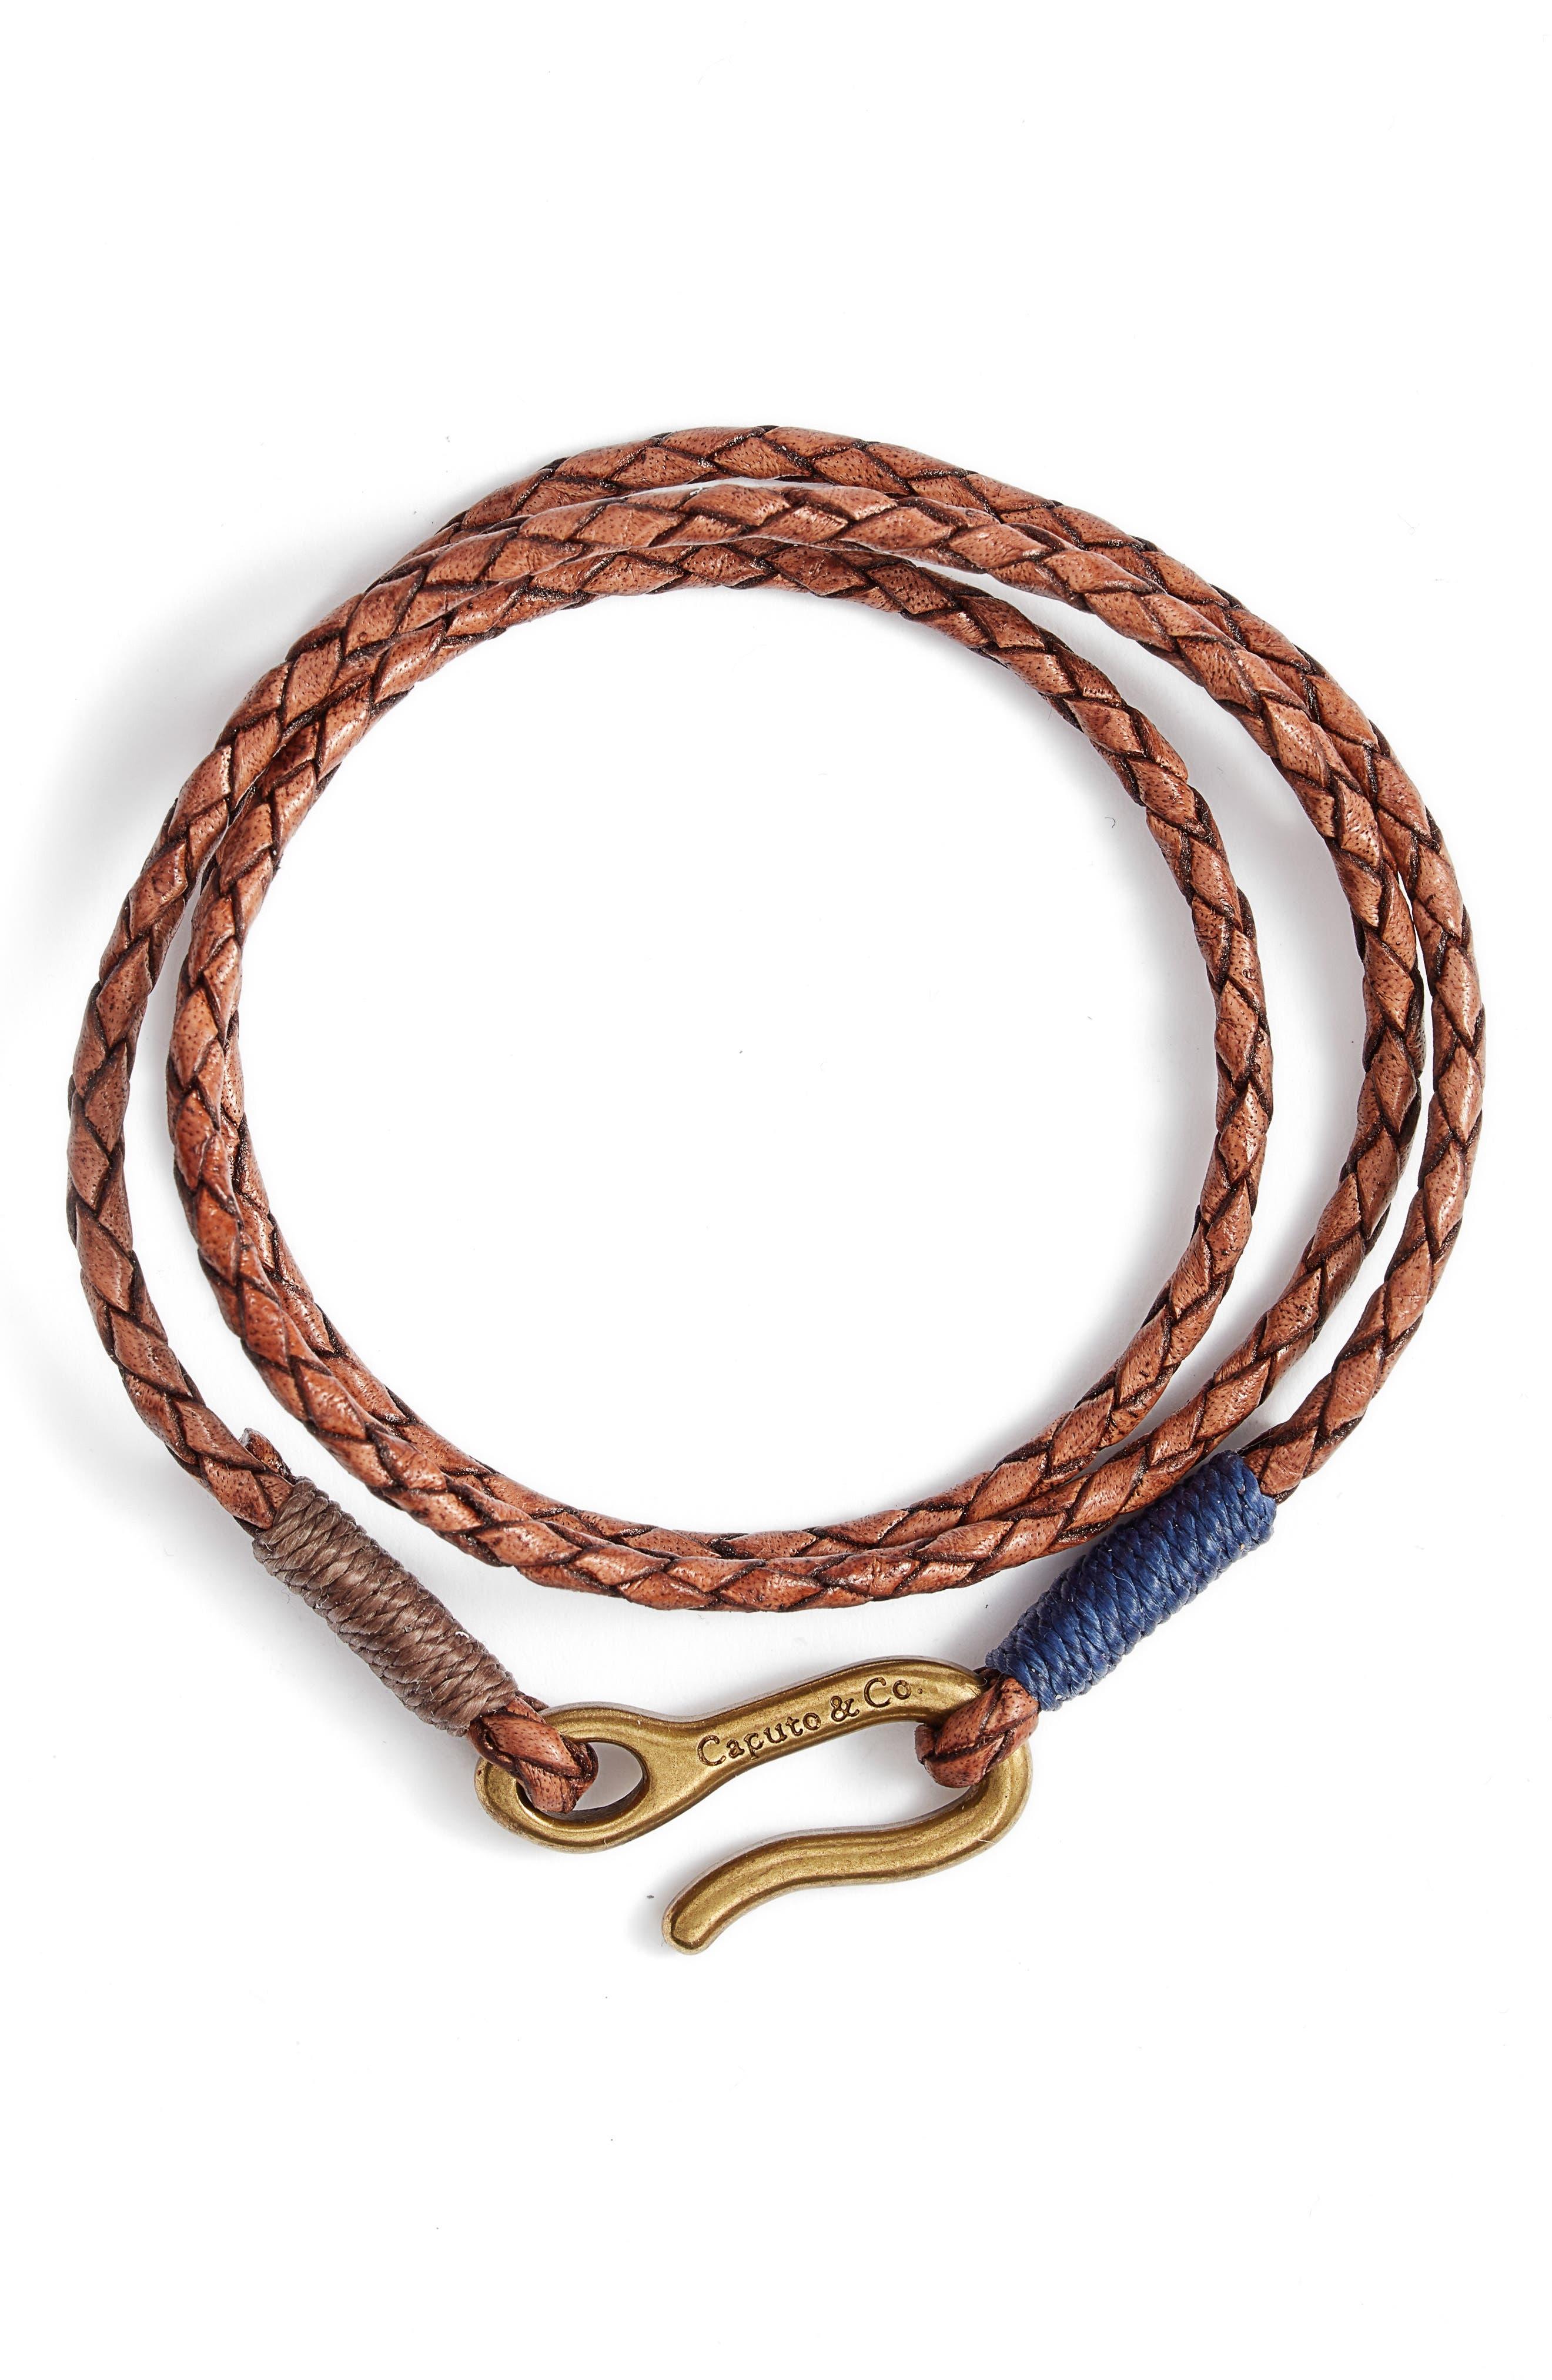 Men's Braided Leather Wrap Bracelet